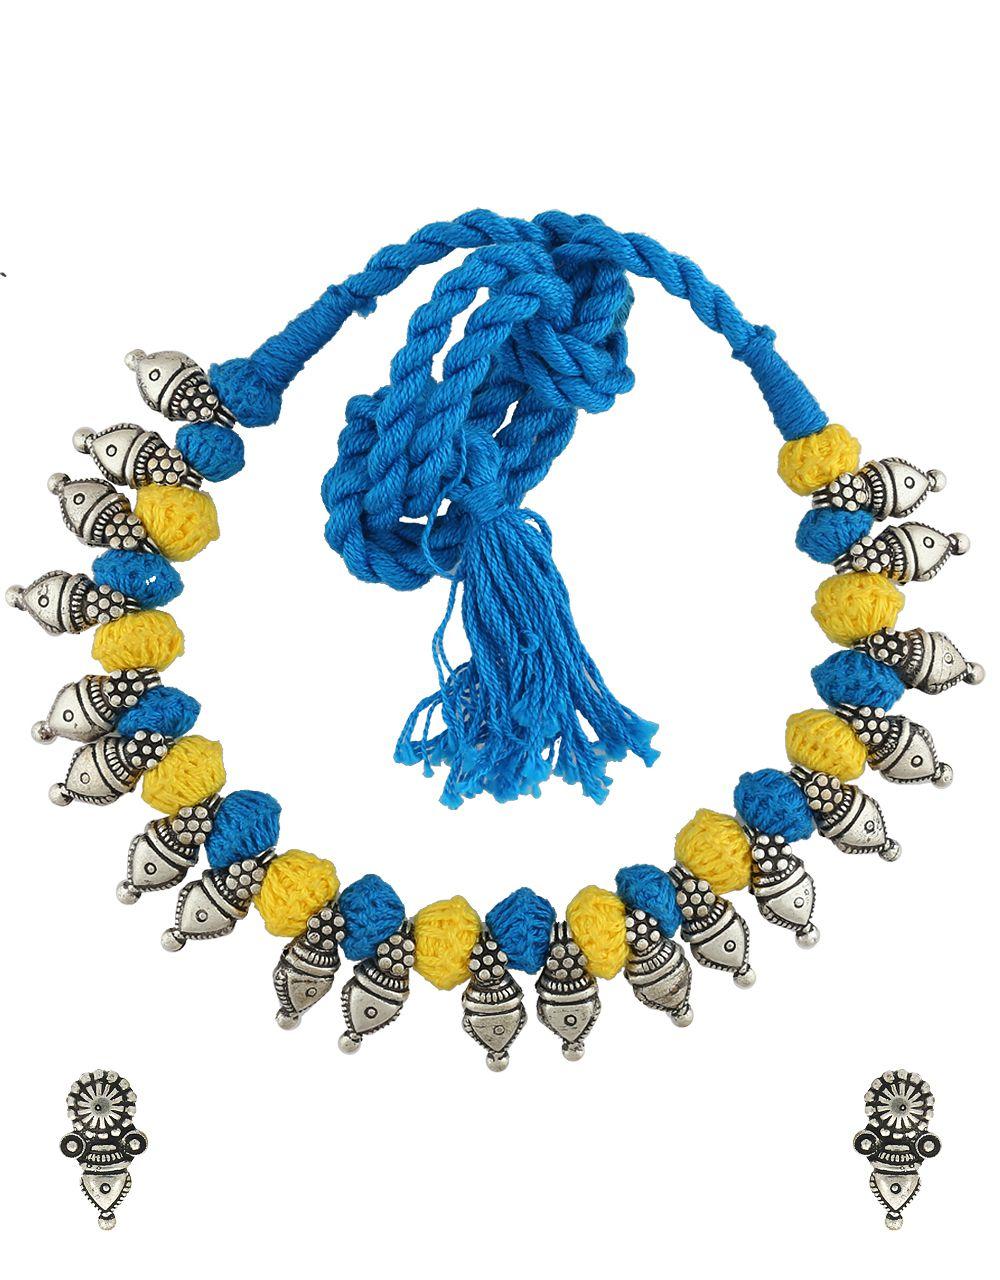 Anuradha Art Silver Tone Oxidized Designer Yellow-Blue Colour Thred Necklace Set For Women/Girls